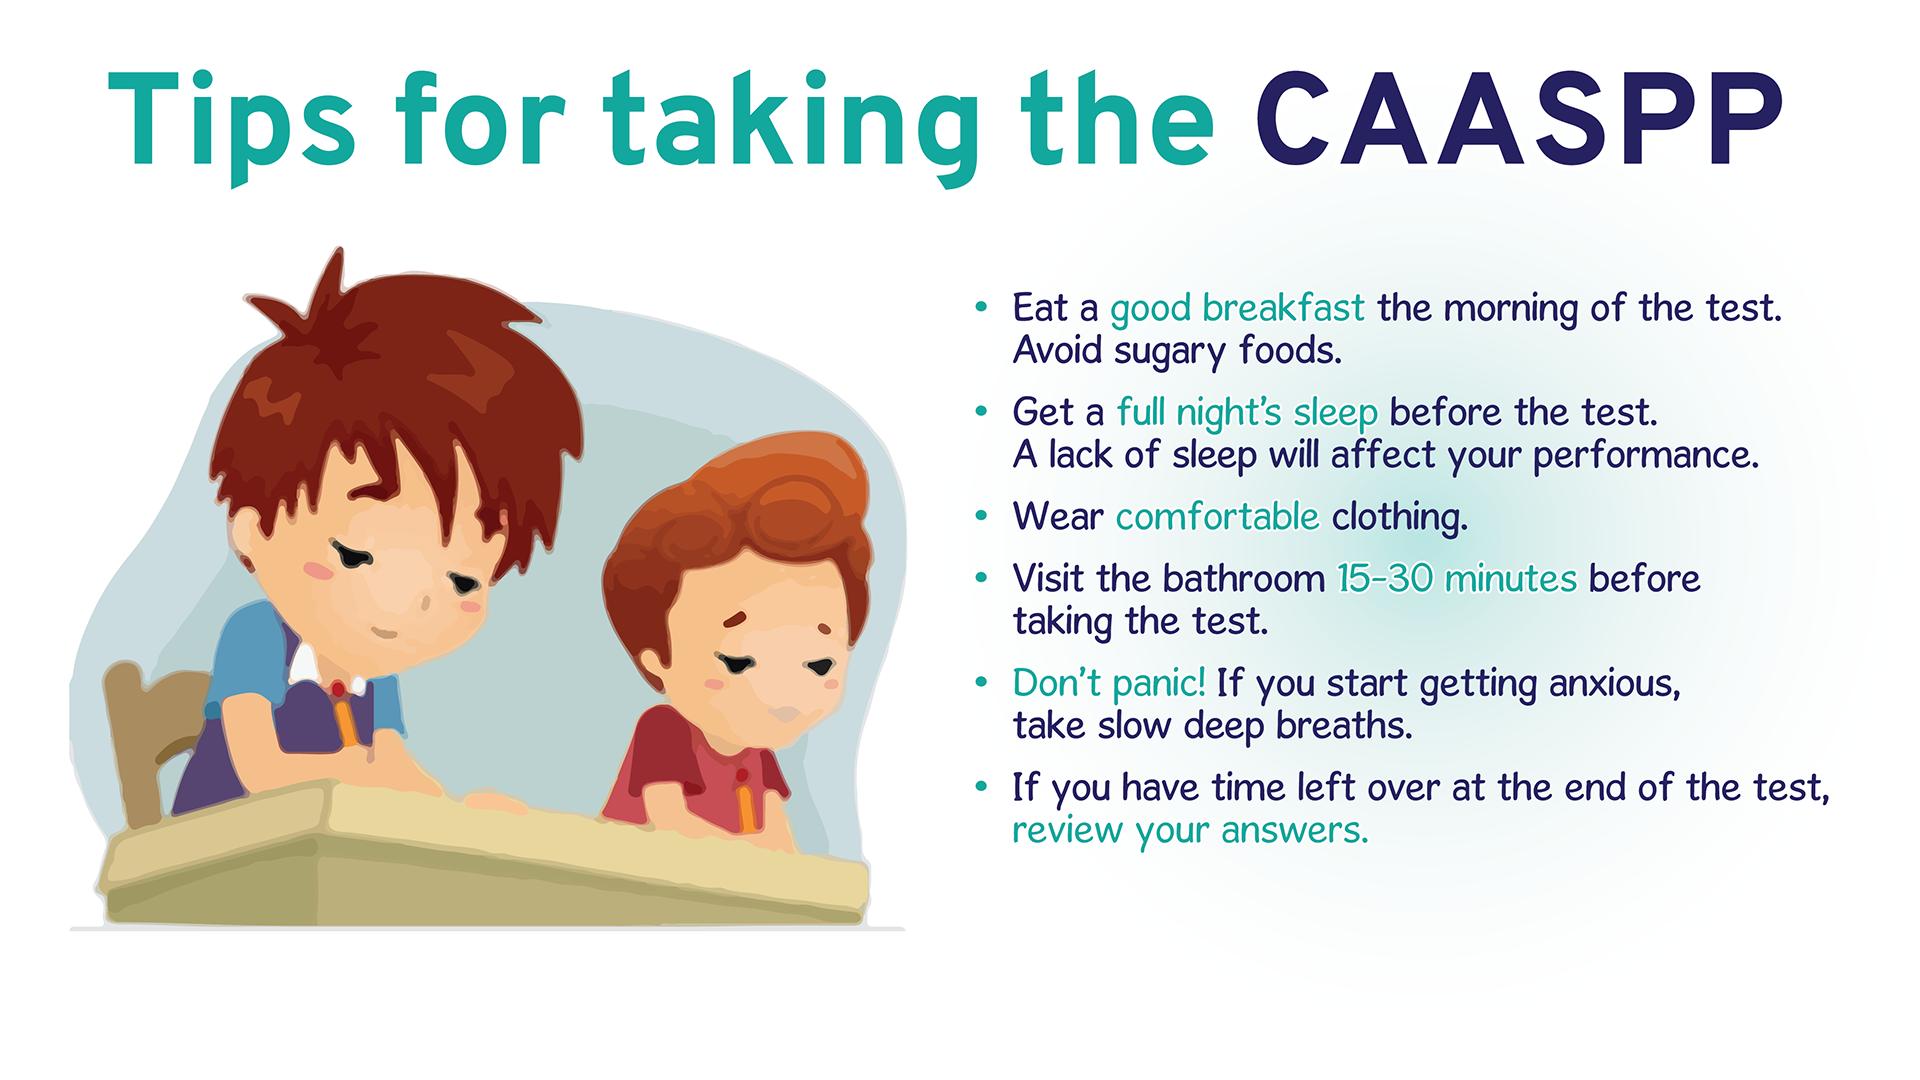 CAASPP Tips